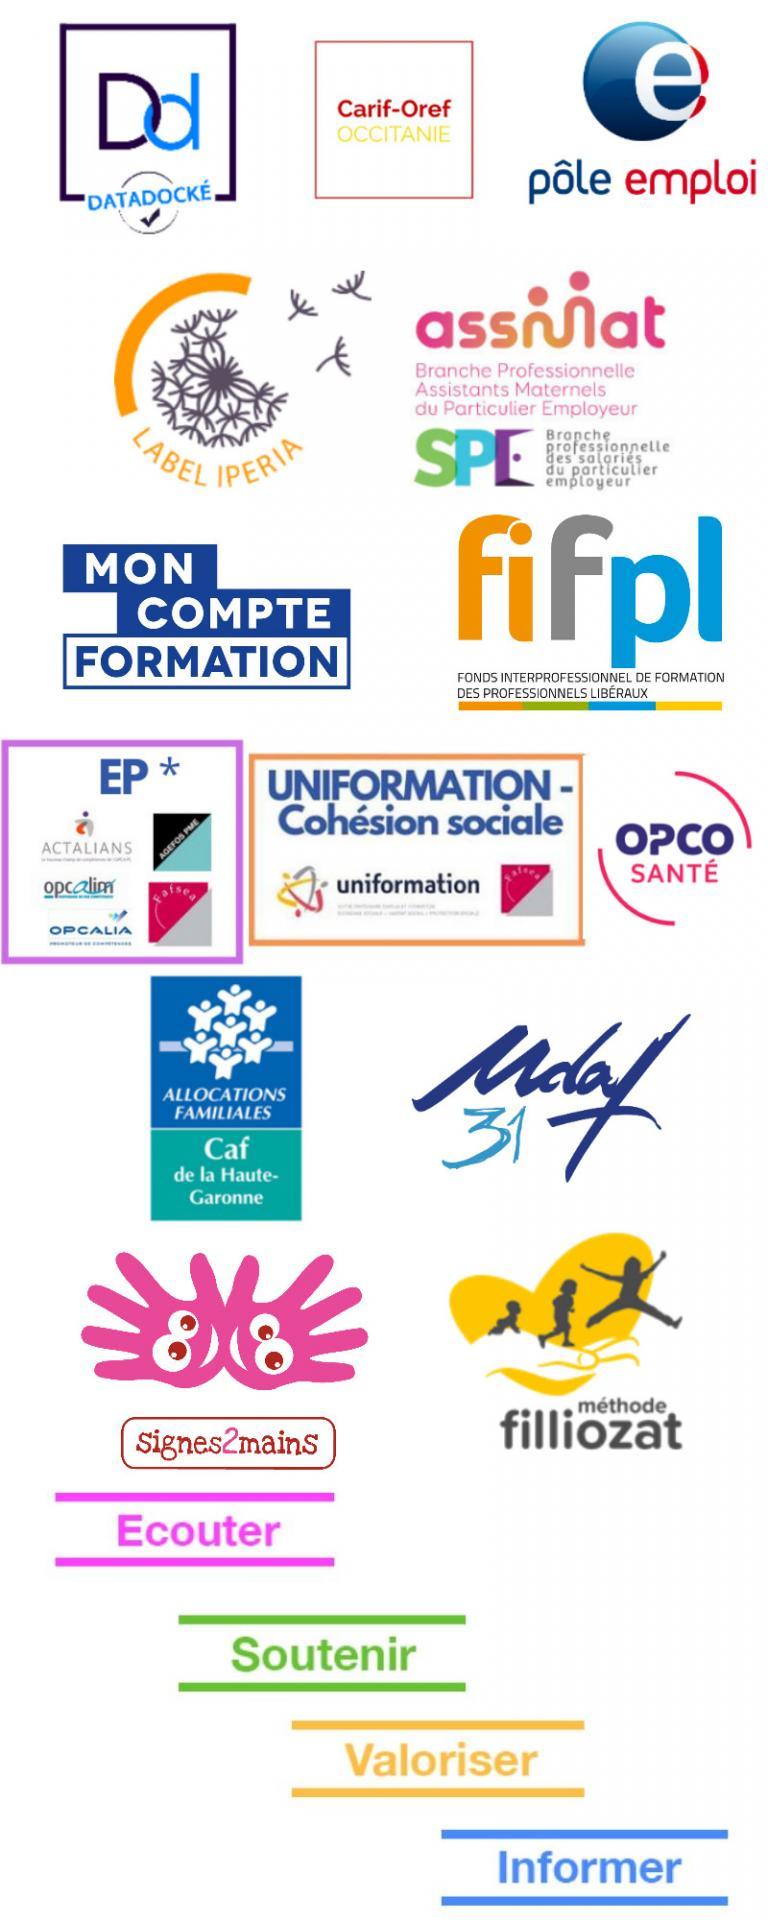 https://www.parentsaujourdhui.org/medias/images/logos-of-6.jpg